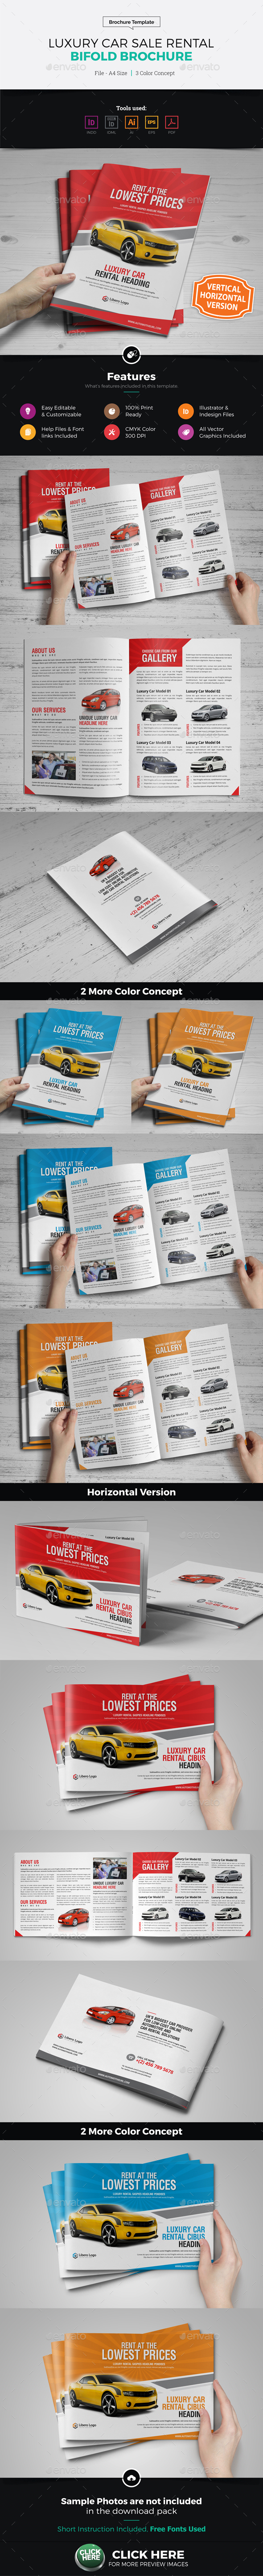 Luxury Car Sale Rental Brochure Design - Corporate Brochures